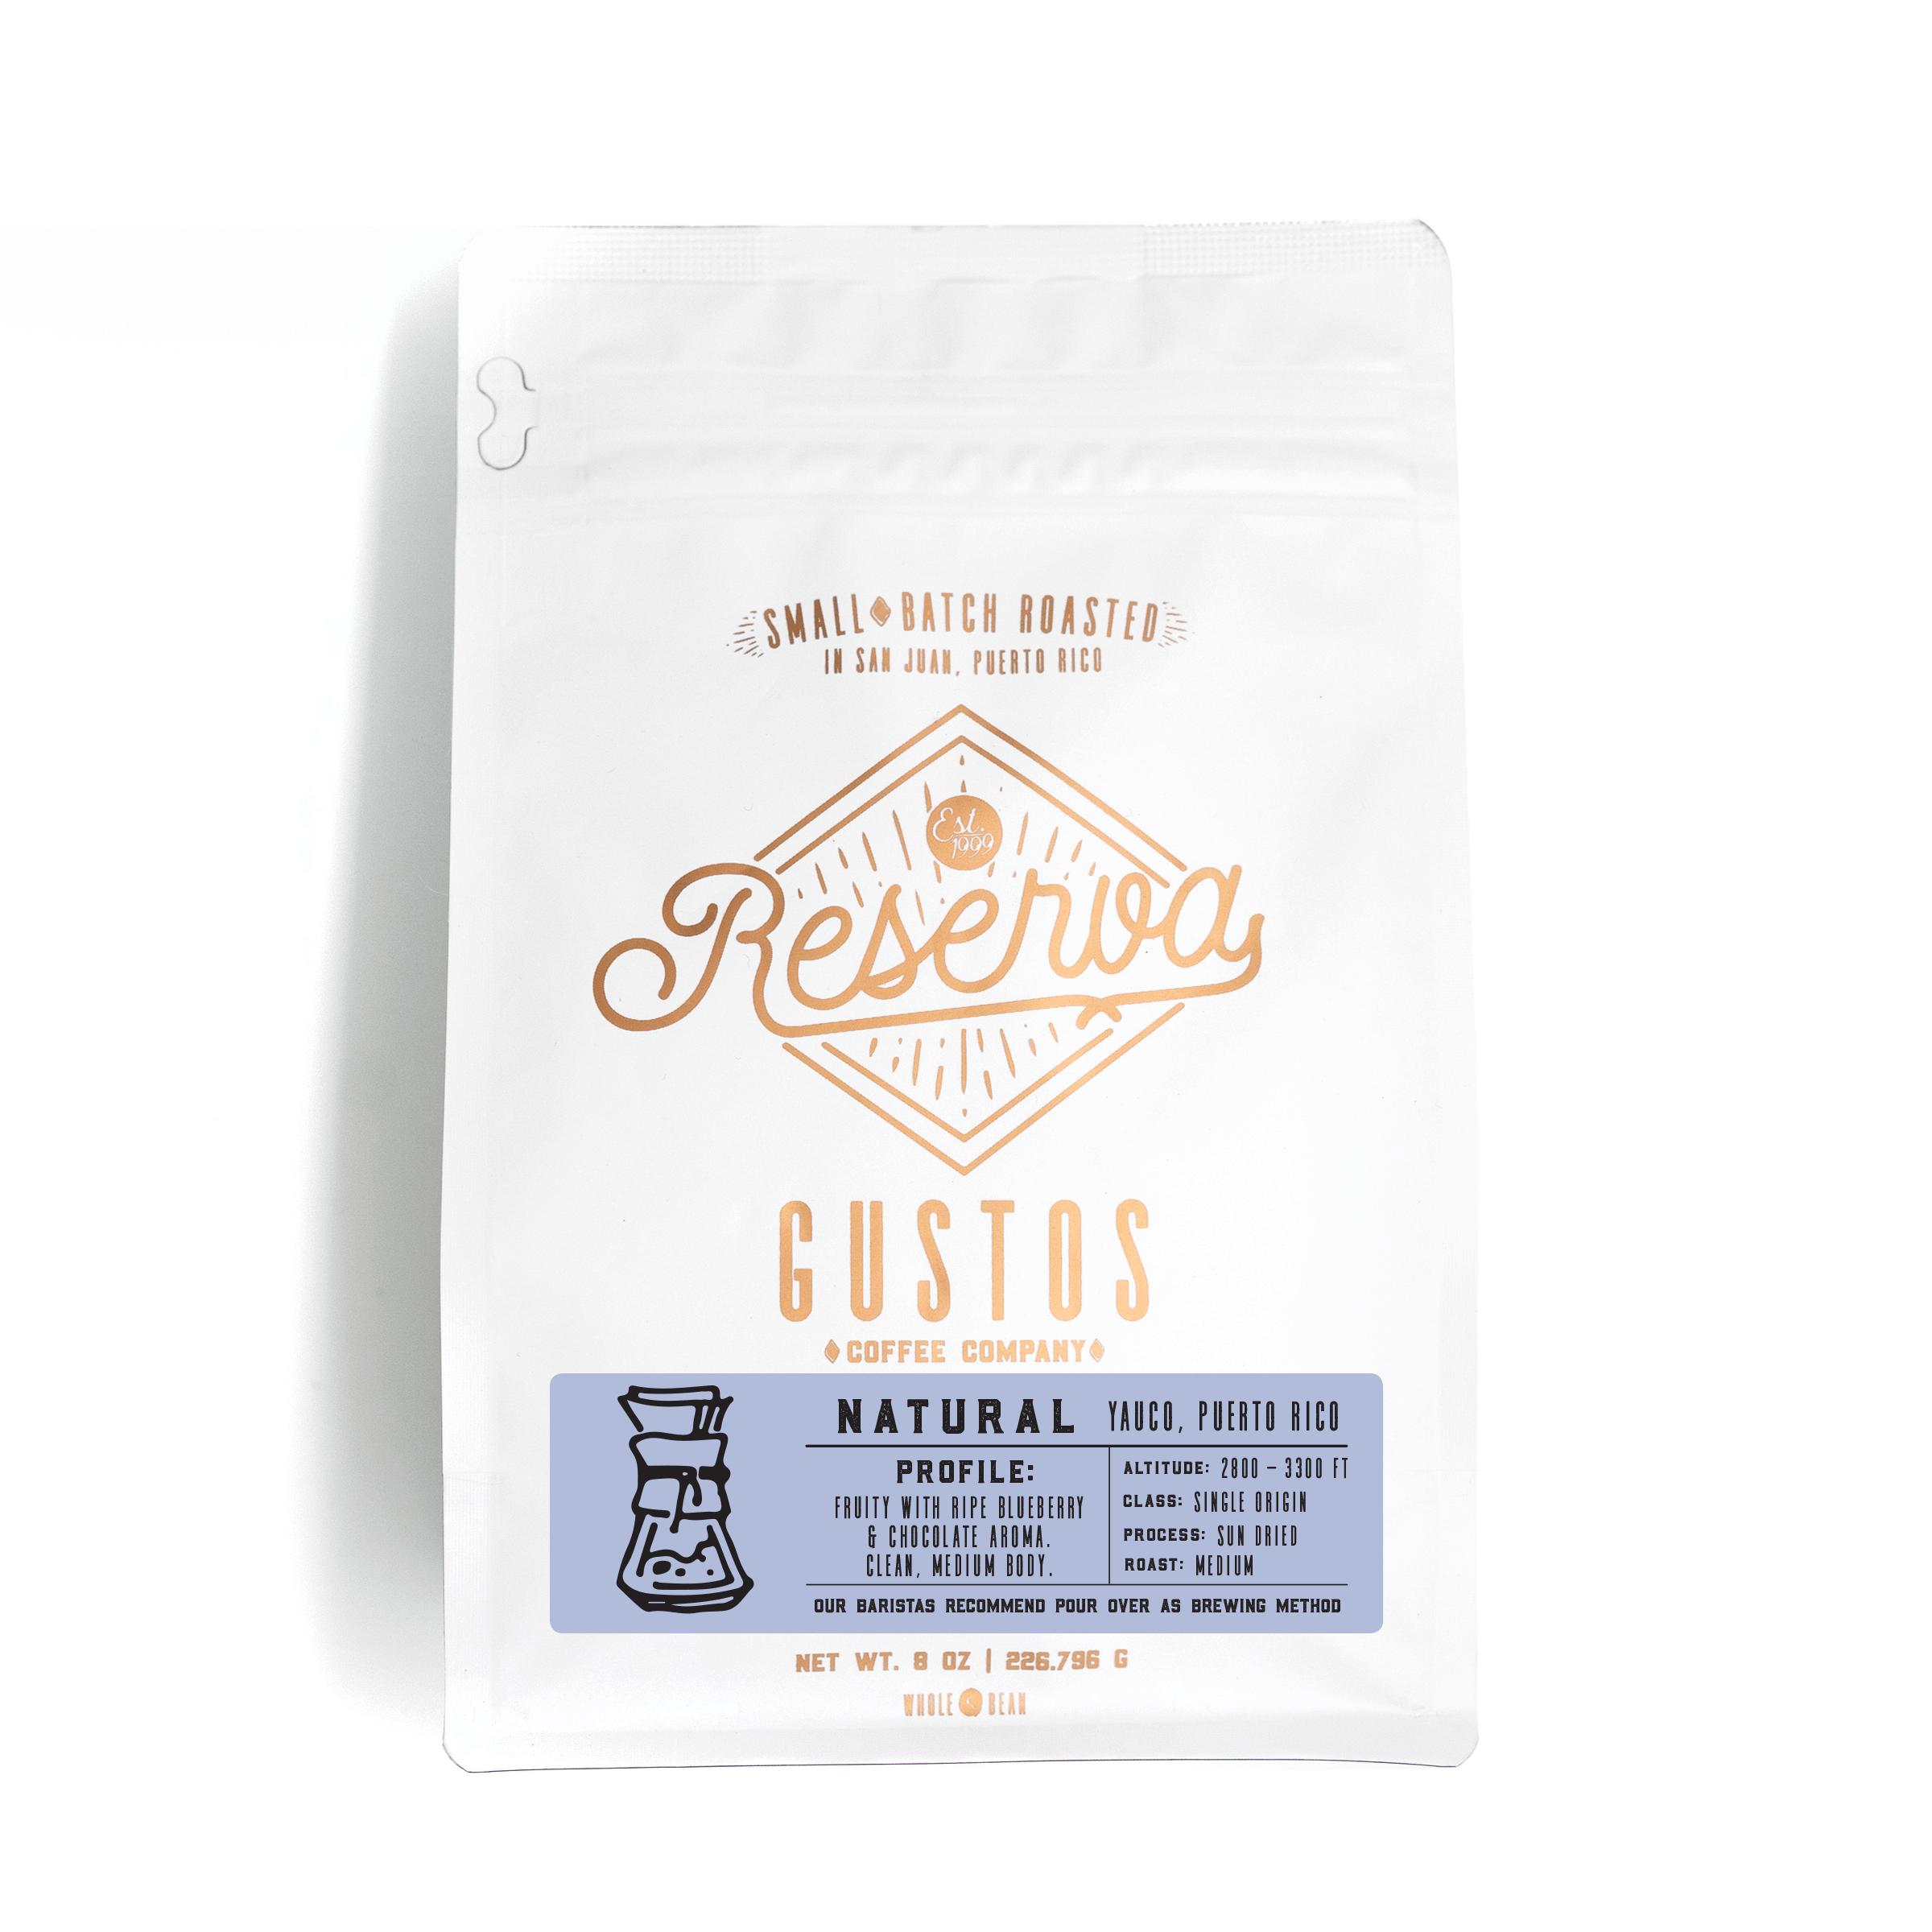 Gustos Reserva Specialty Coffee Single Origin Natural Yauco Puerto Rico 8 oz Whole Bean Grano